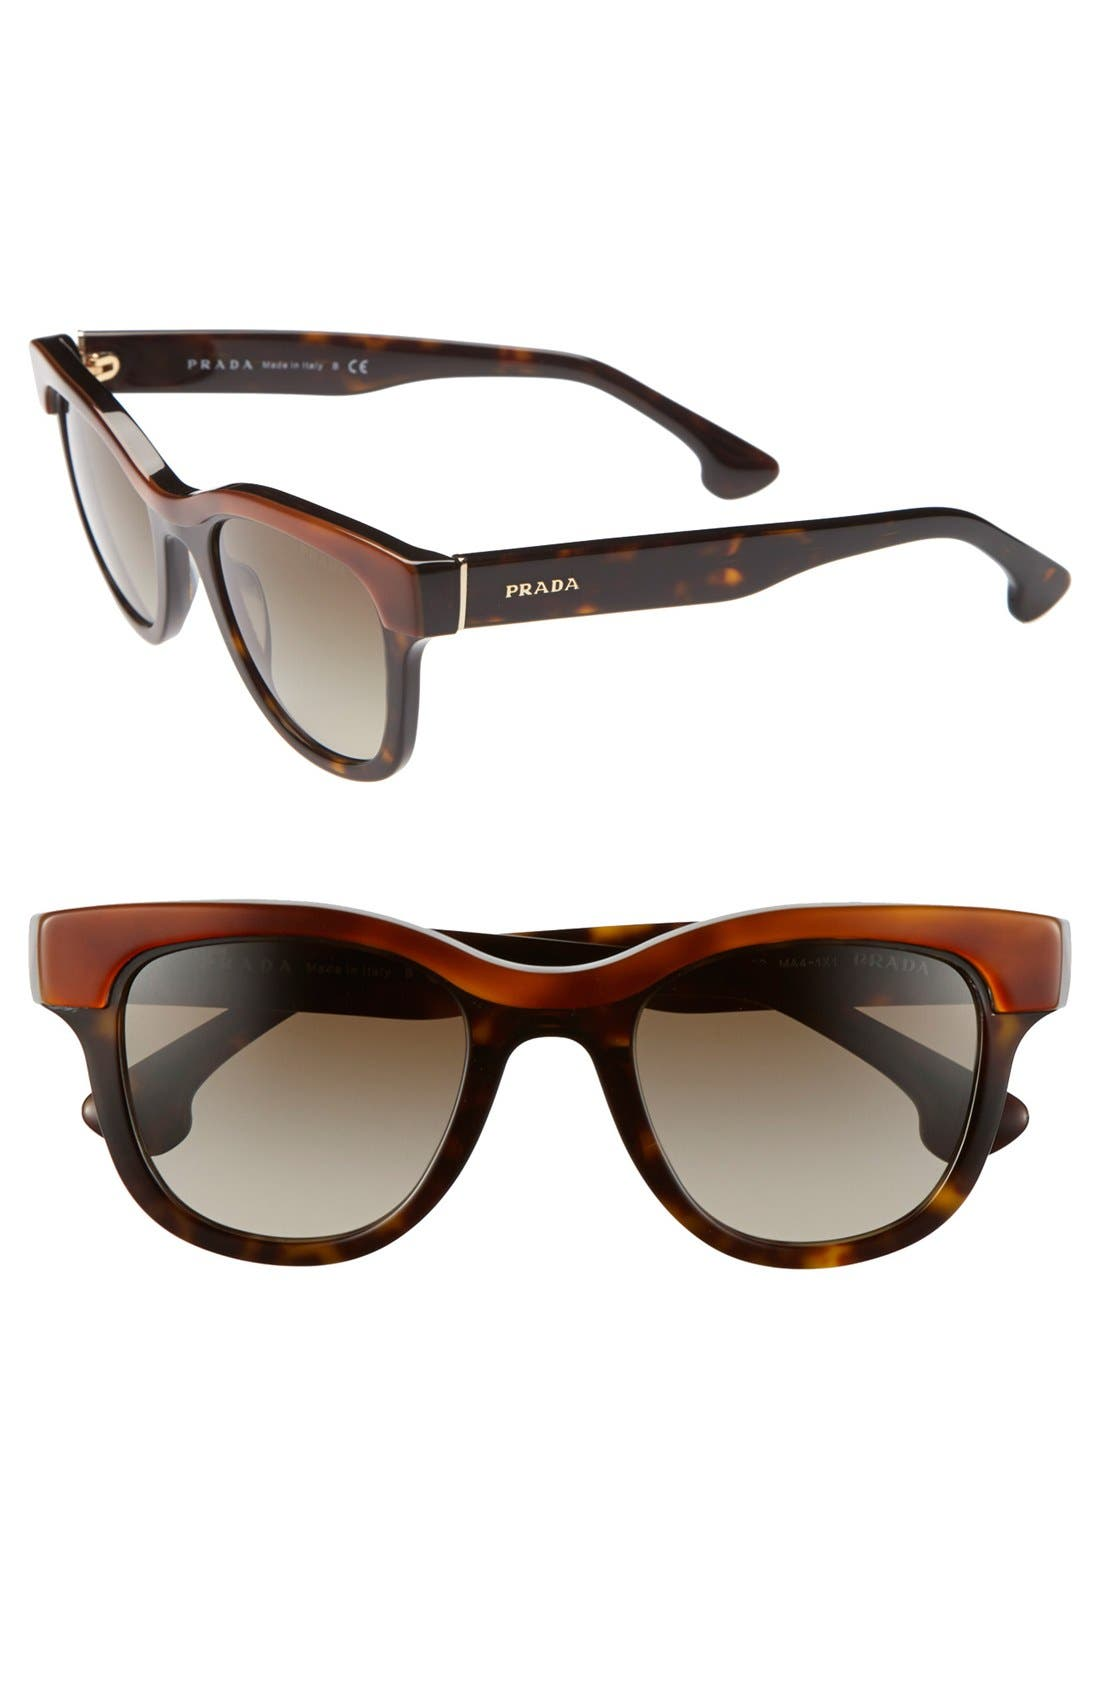 Main Image - Prada 'Crow' 49mm Sunglasses